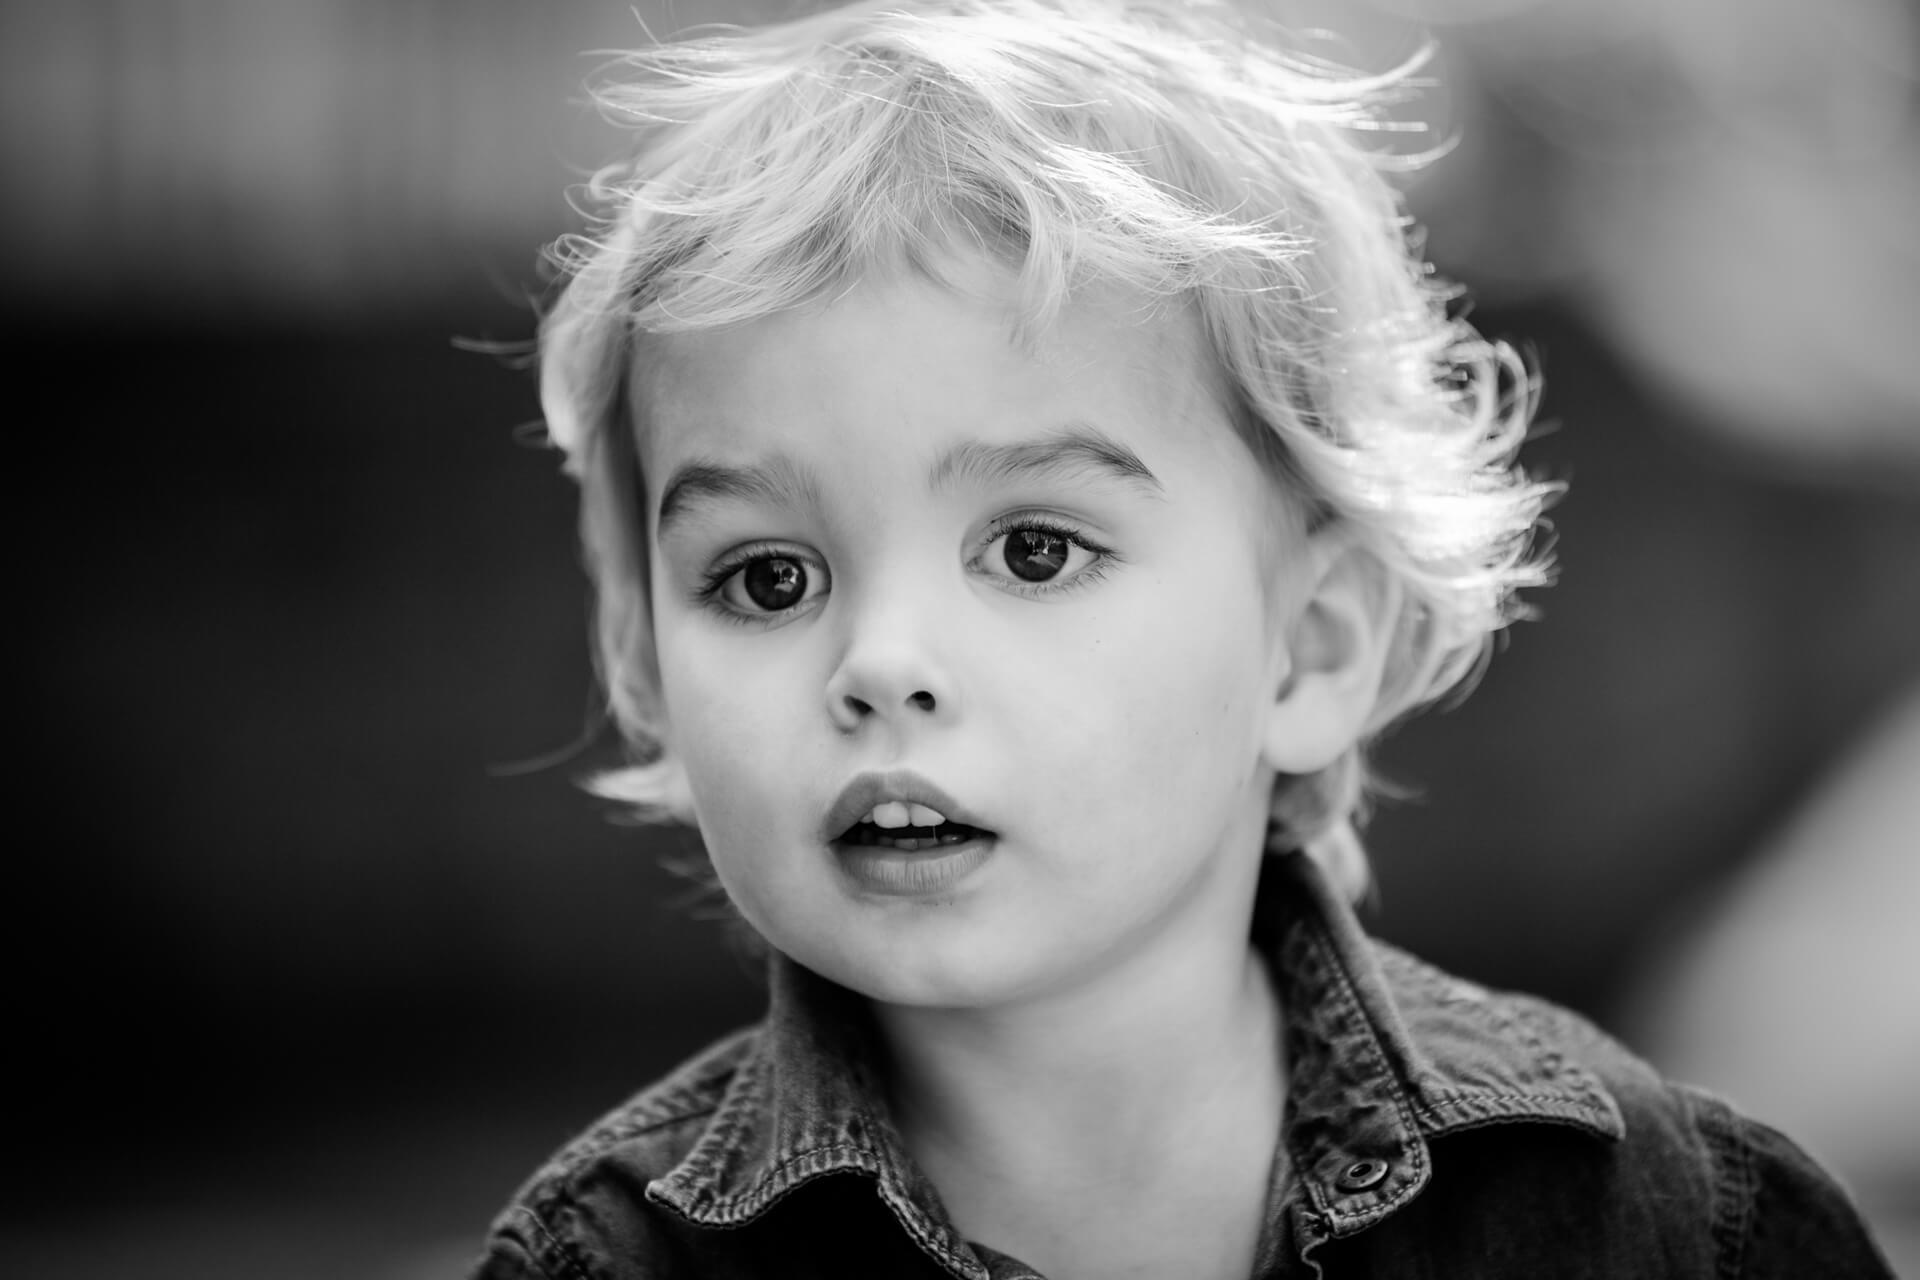 portrait of a toddler boy